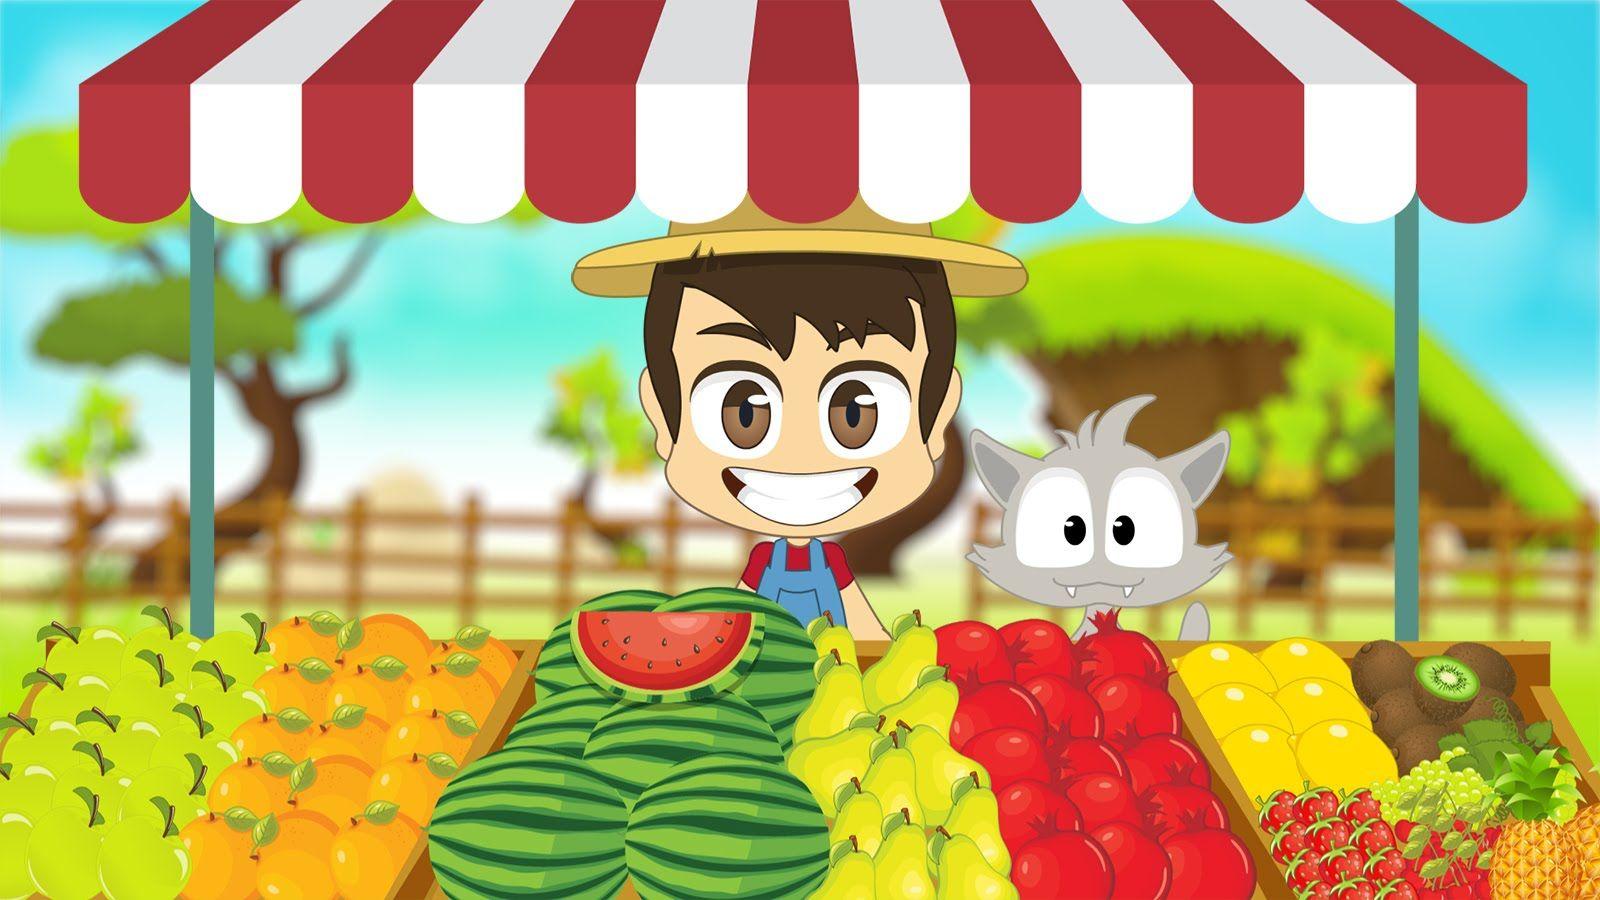 Fruits In Arabic For Kids أسماء الفواكه باللغة العربية للأطفال Learning Arabic Learn Arabic Online Arabic Lessons